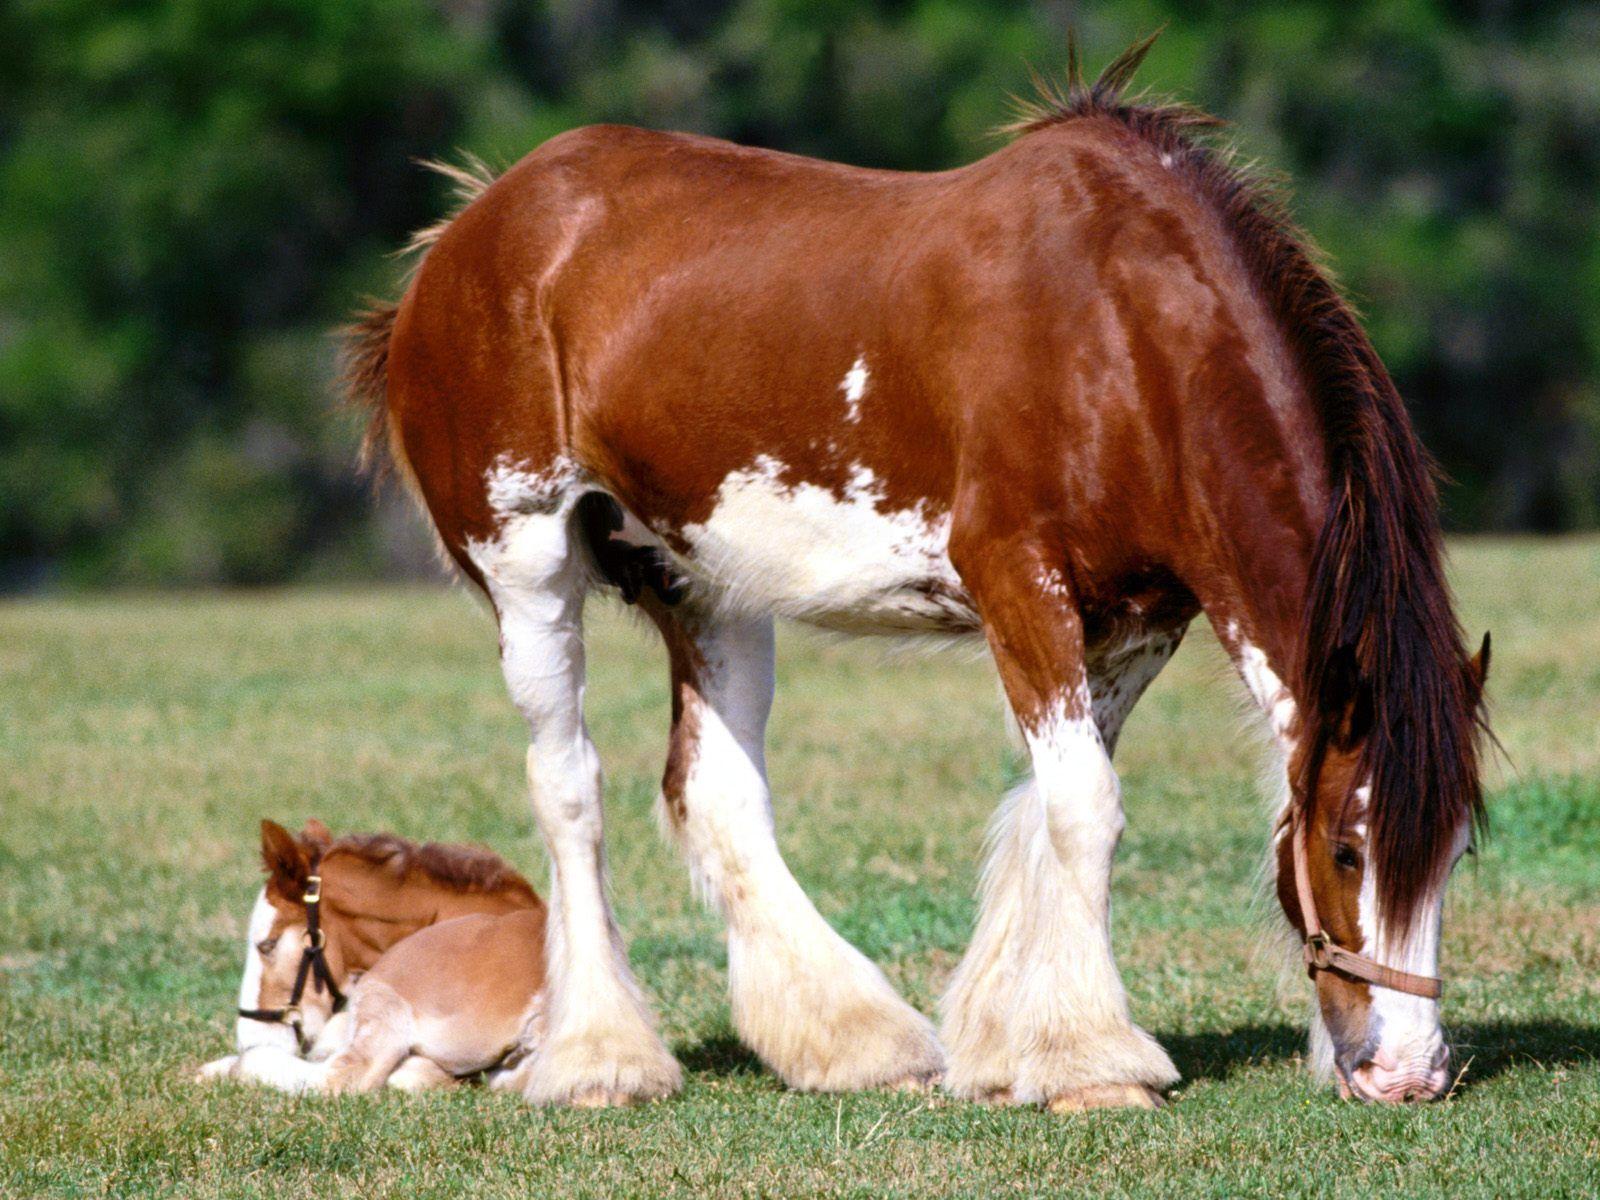 Fantastic Wallpaper Horse Family - d1200826c7d3dda024a0735a3b32c8dc  Best Photo Reference_487795.jpg